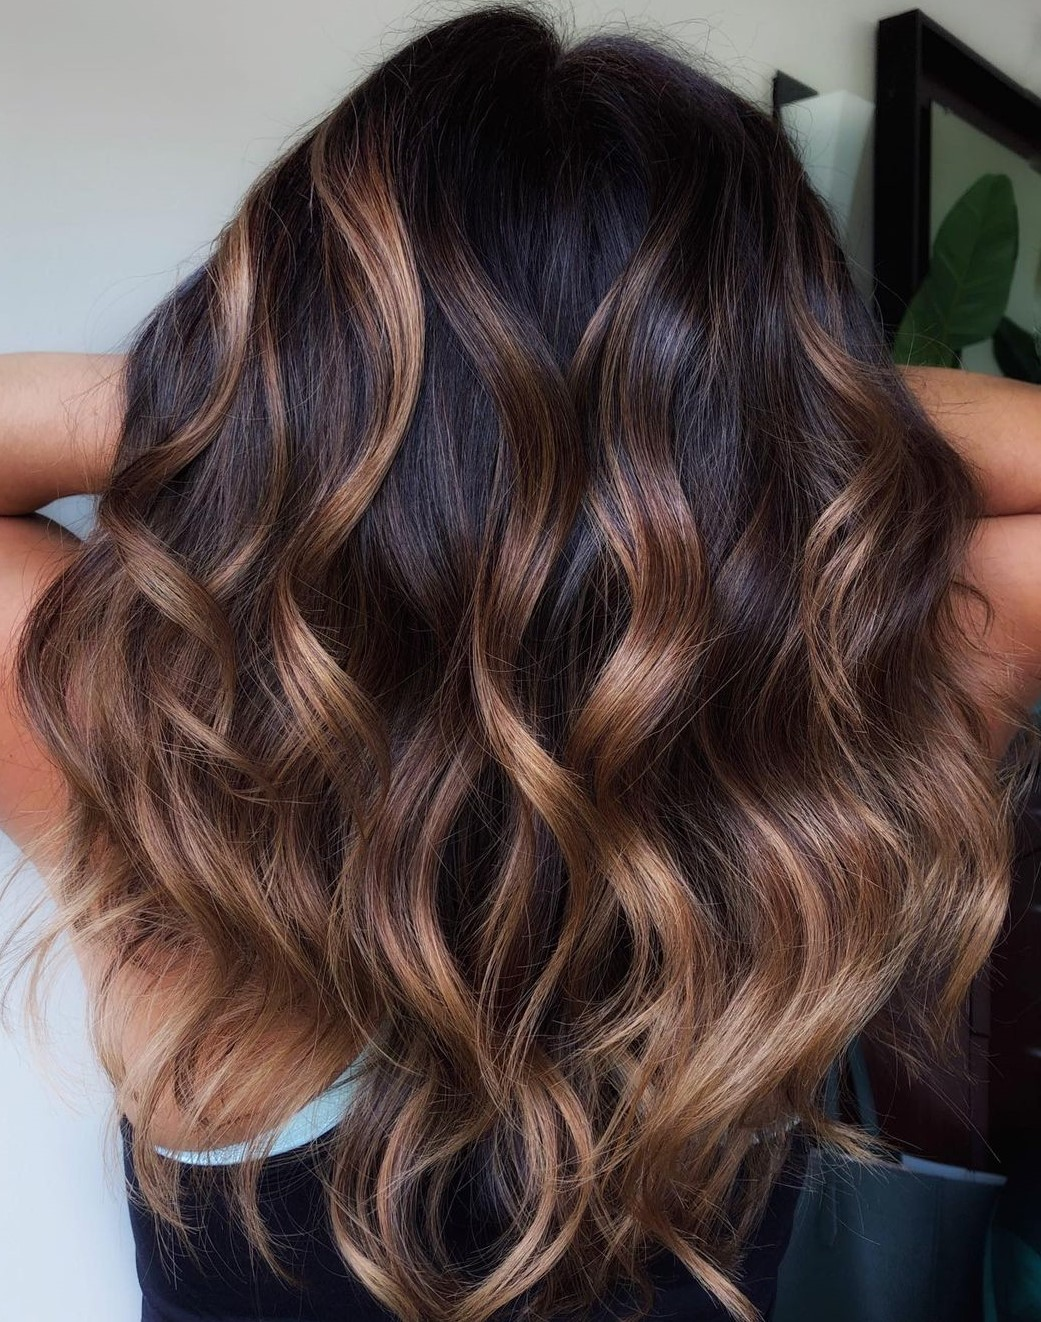 Golden Brown Highlights for Dark Hair